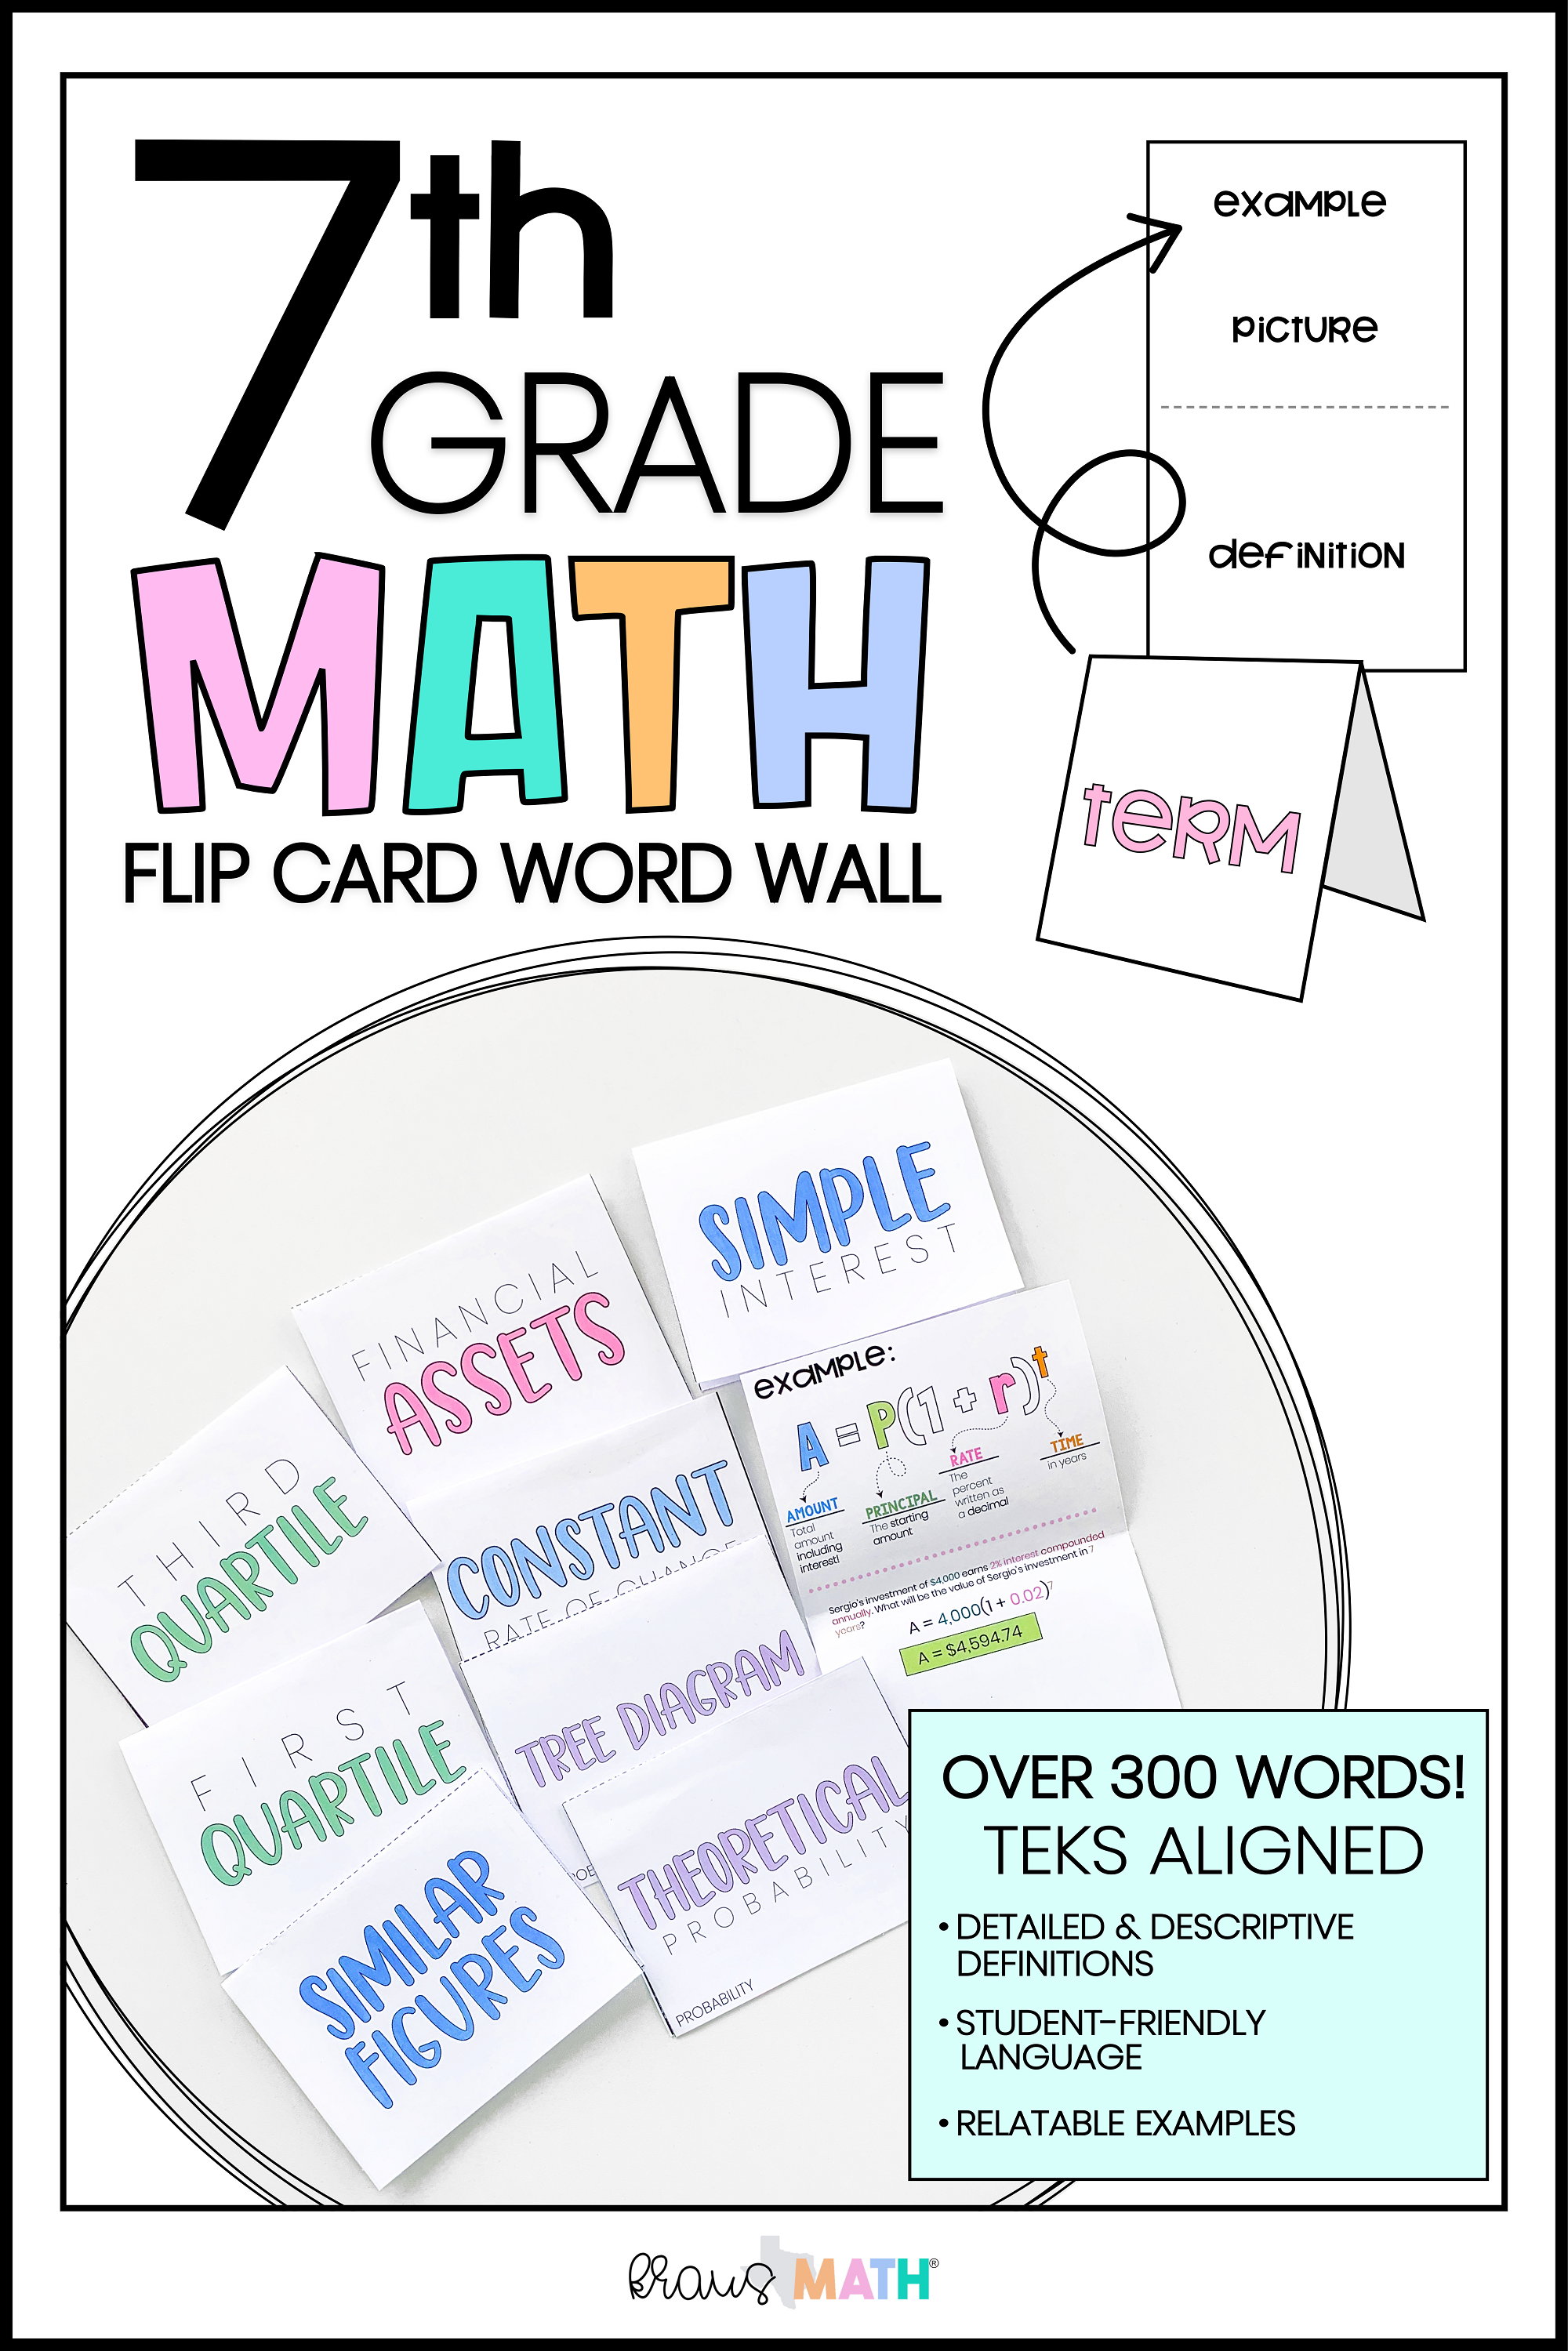 7th Grade Math Flip Card Word Wall Kraus Math 7th Grade Math Math Word Walls Homeschool Math [ 2999 x 2000 Pixel ]